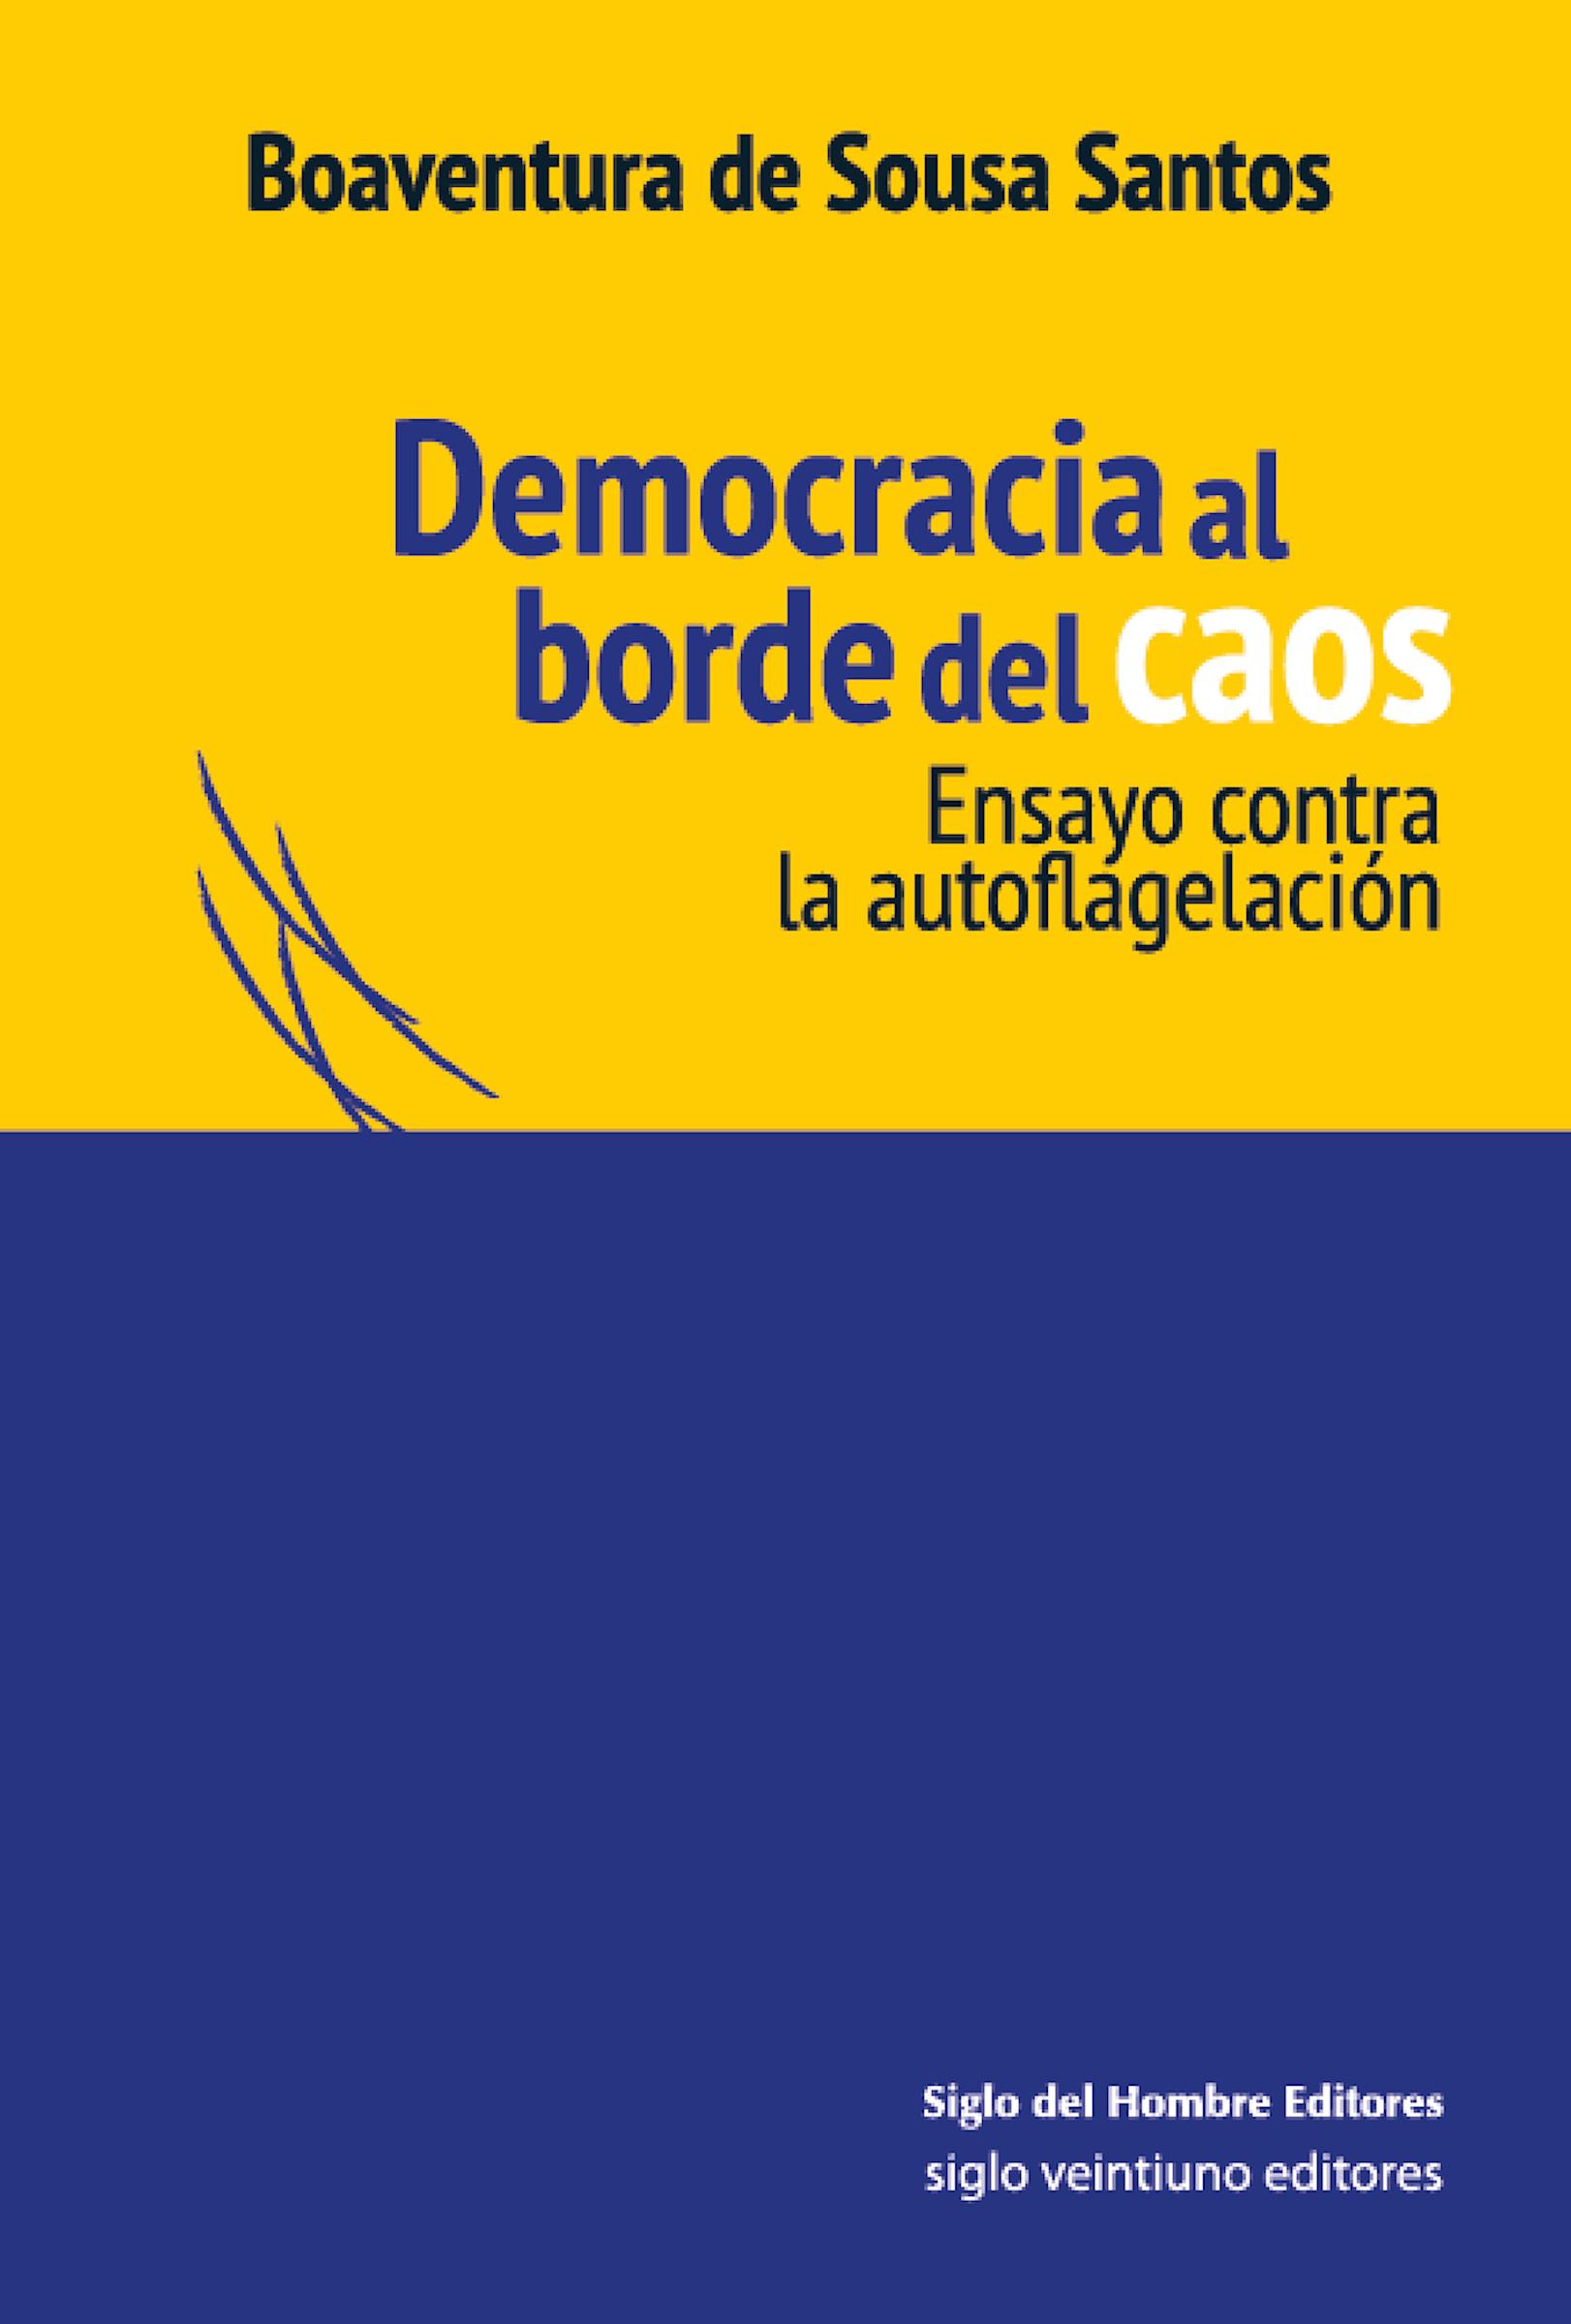 Boaventura de Sousa Santos Democracia al borde del caos caos calmo